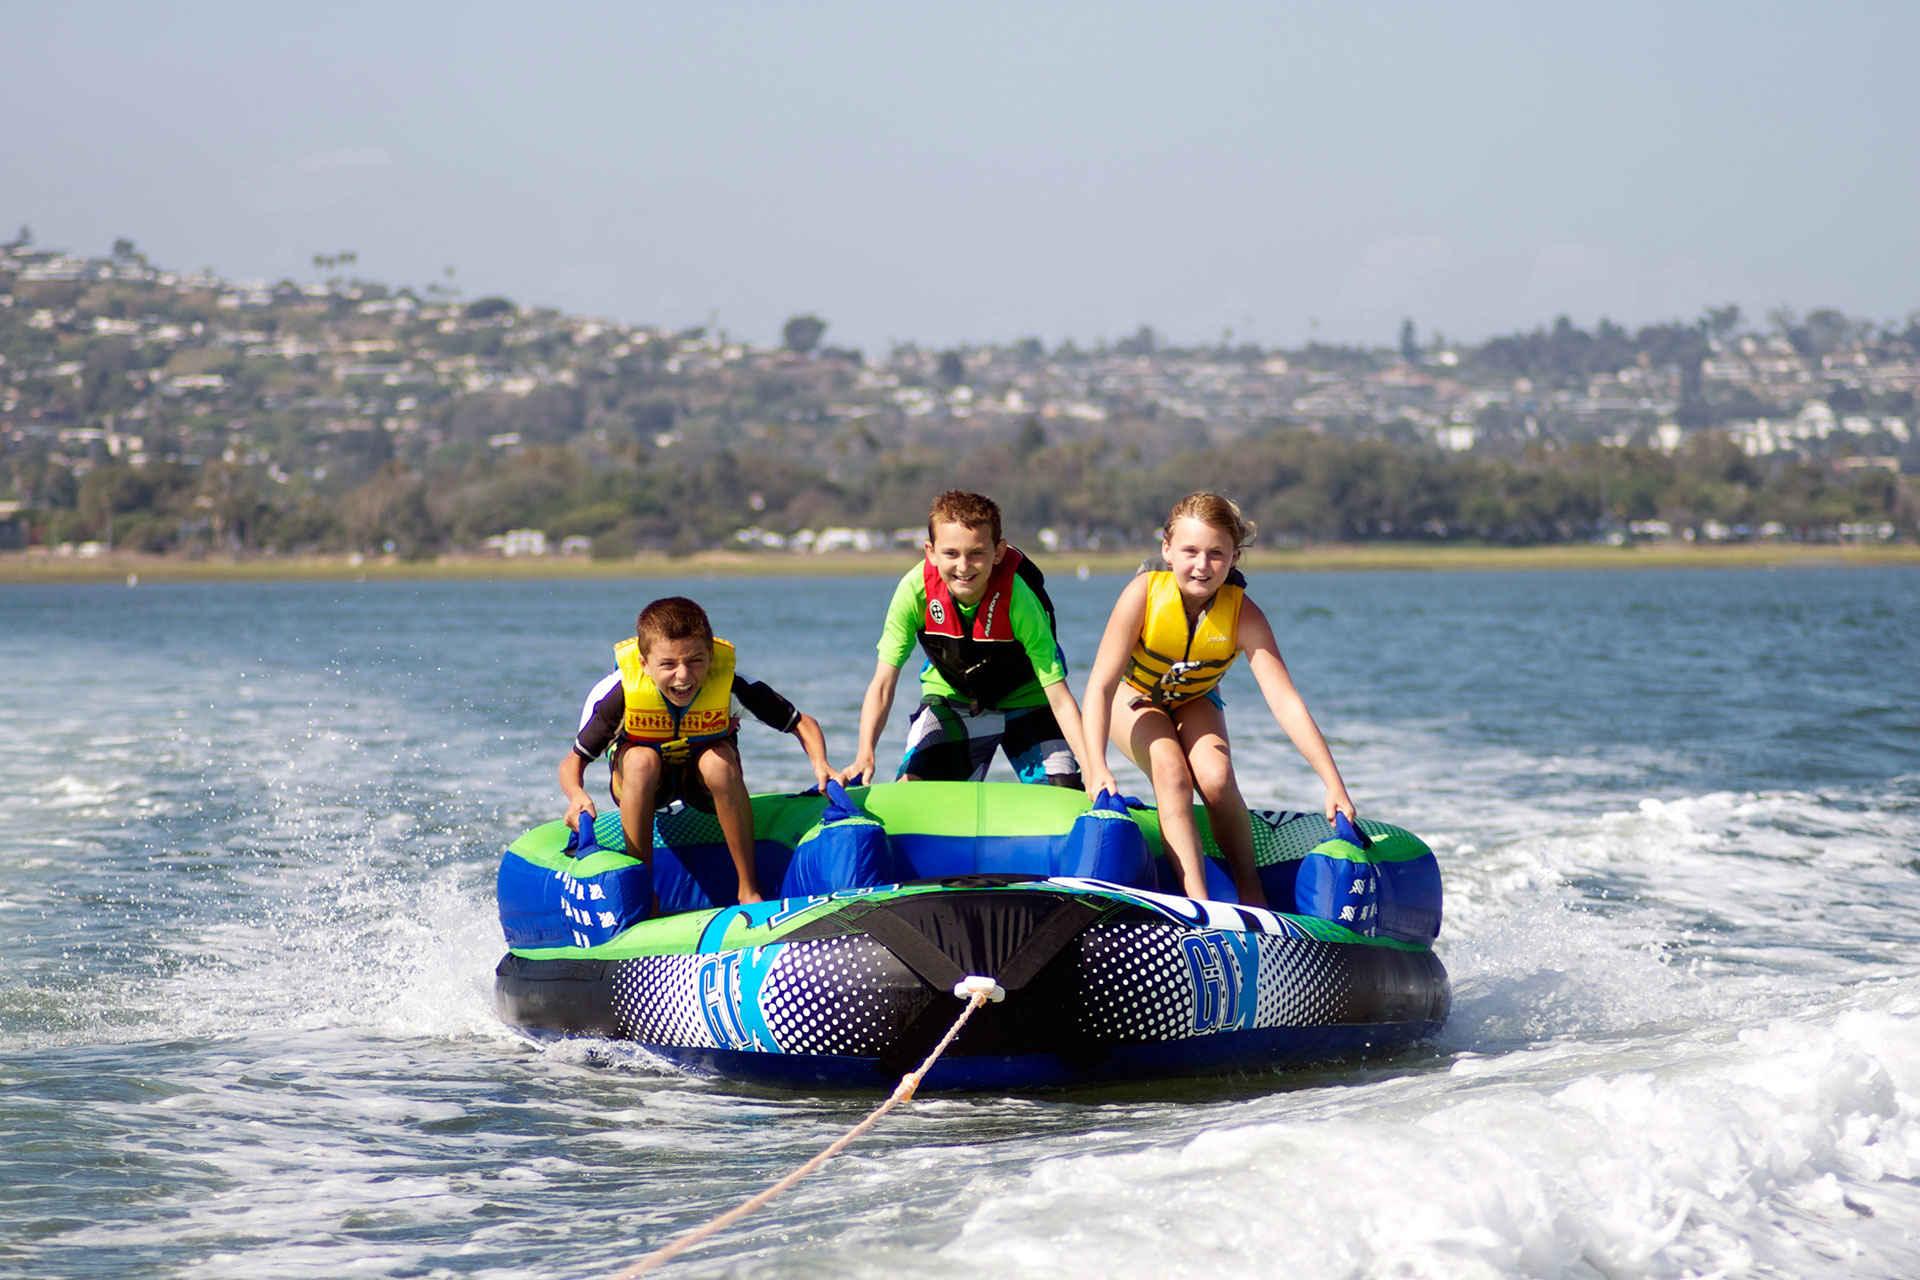 Kids Boating in San Diego, California